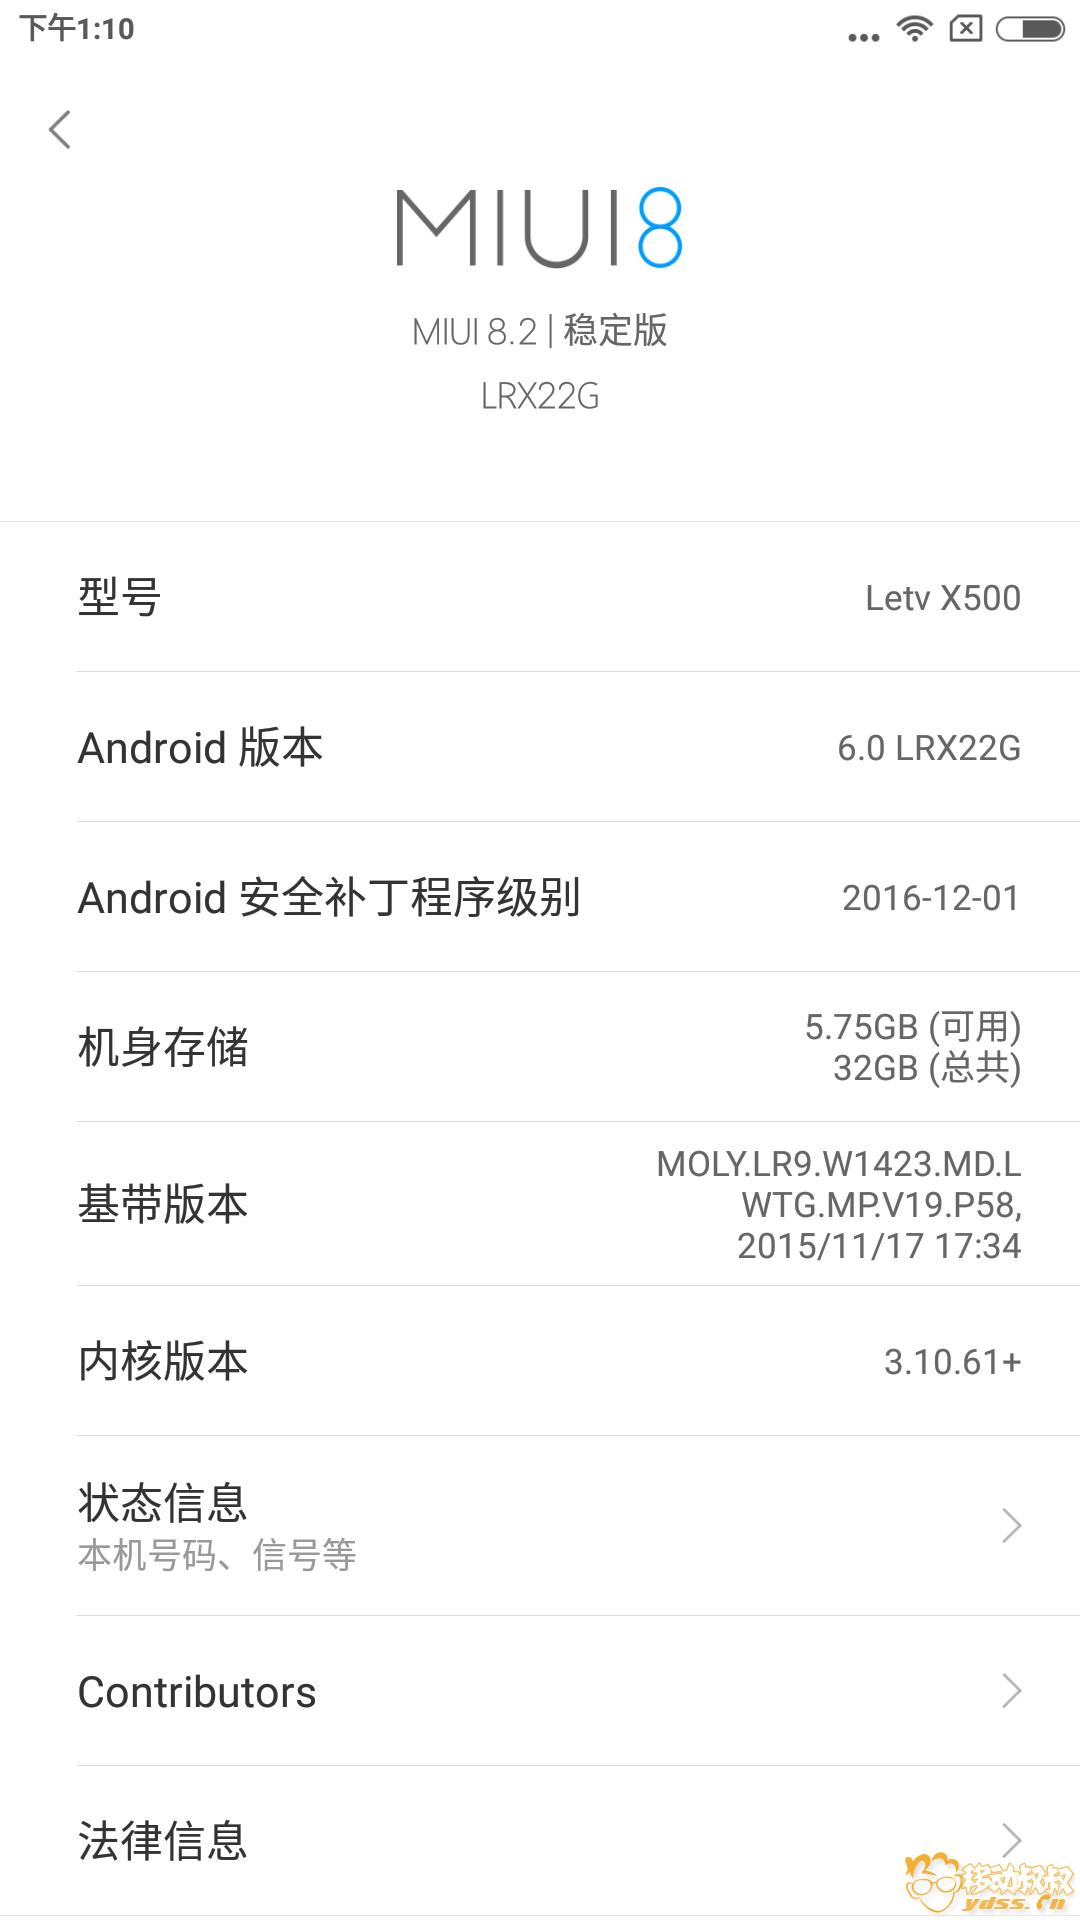 Screenshot_2017-11-29-13-10-00-166_com.android.settings.png